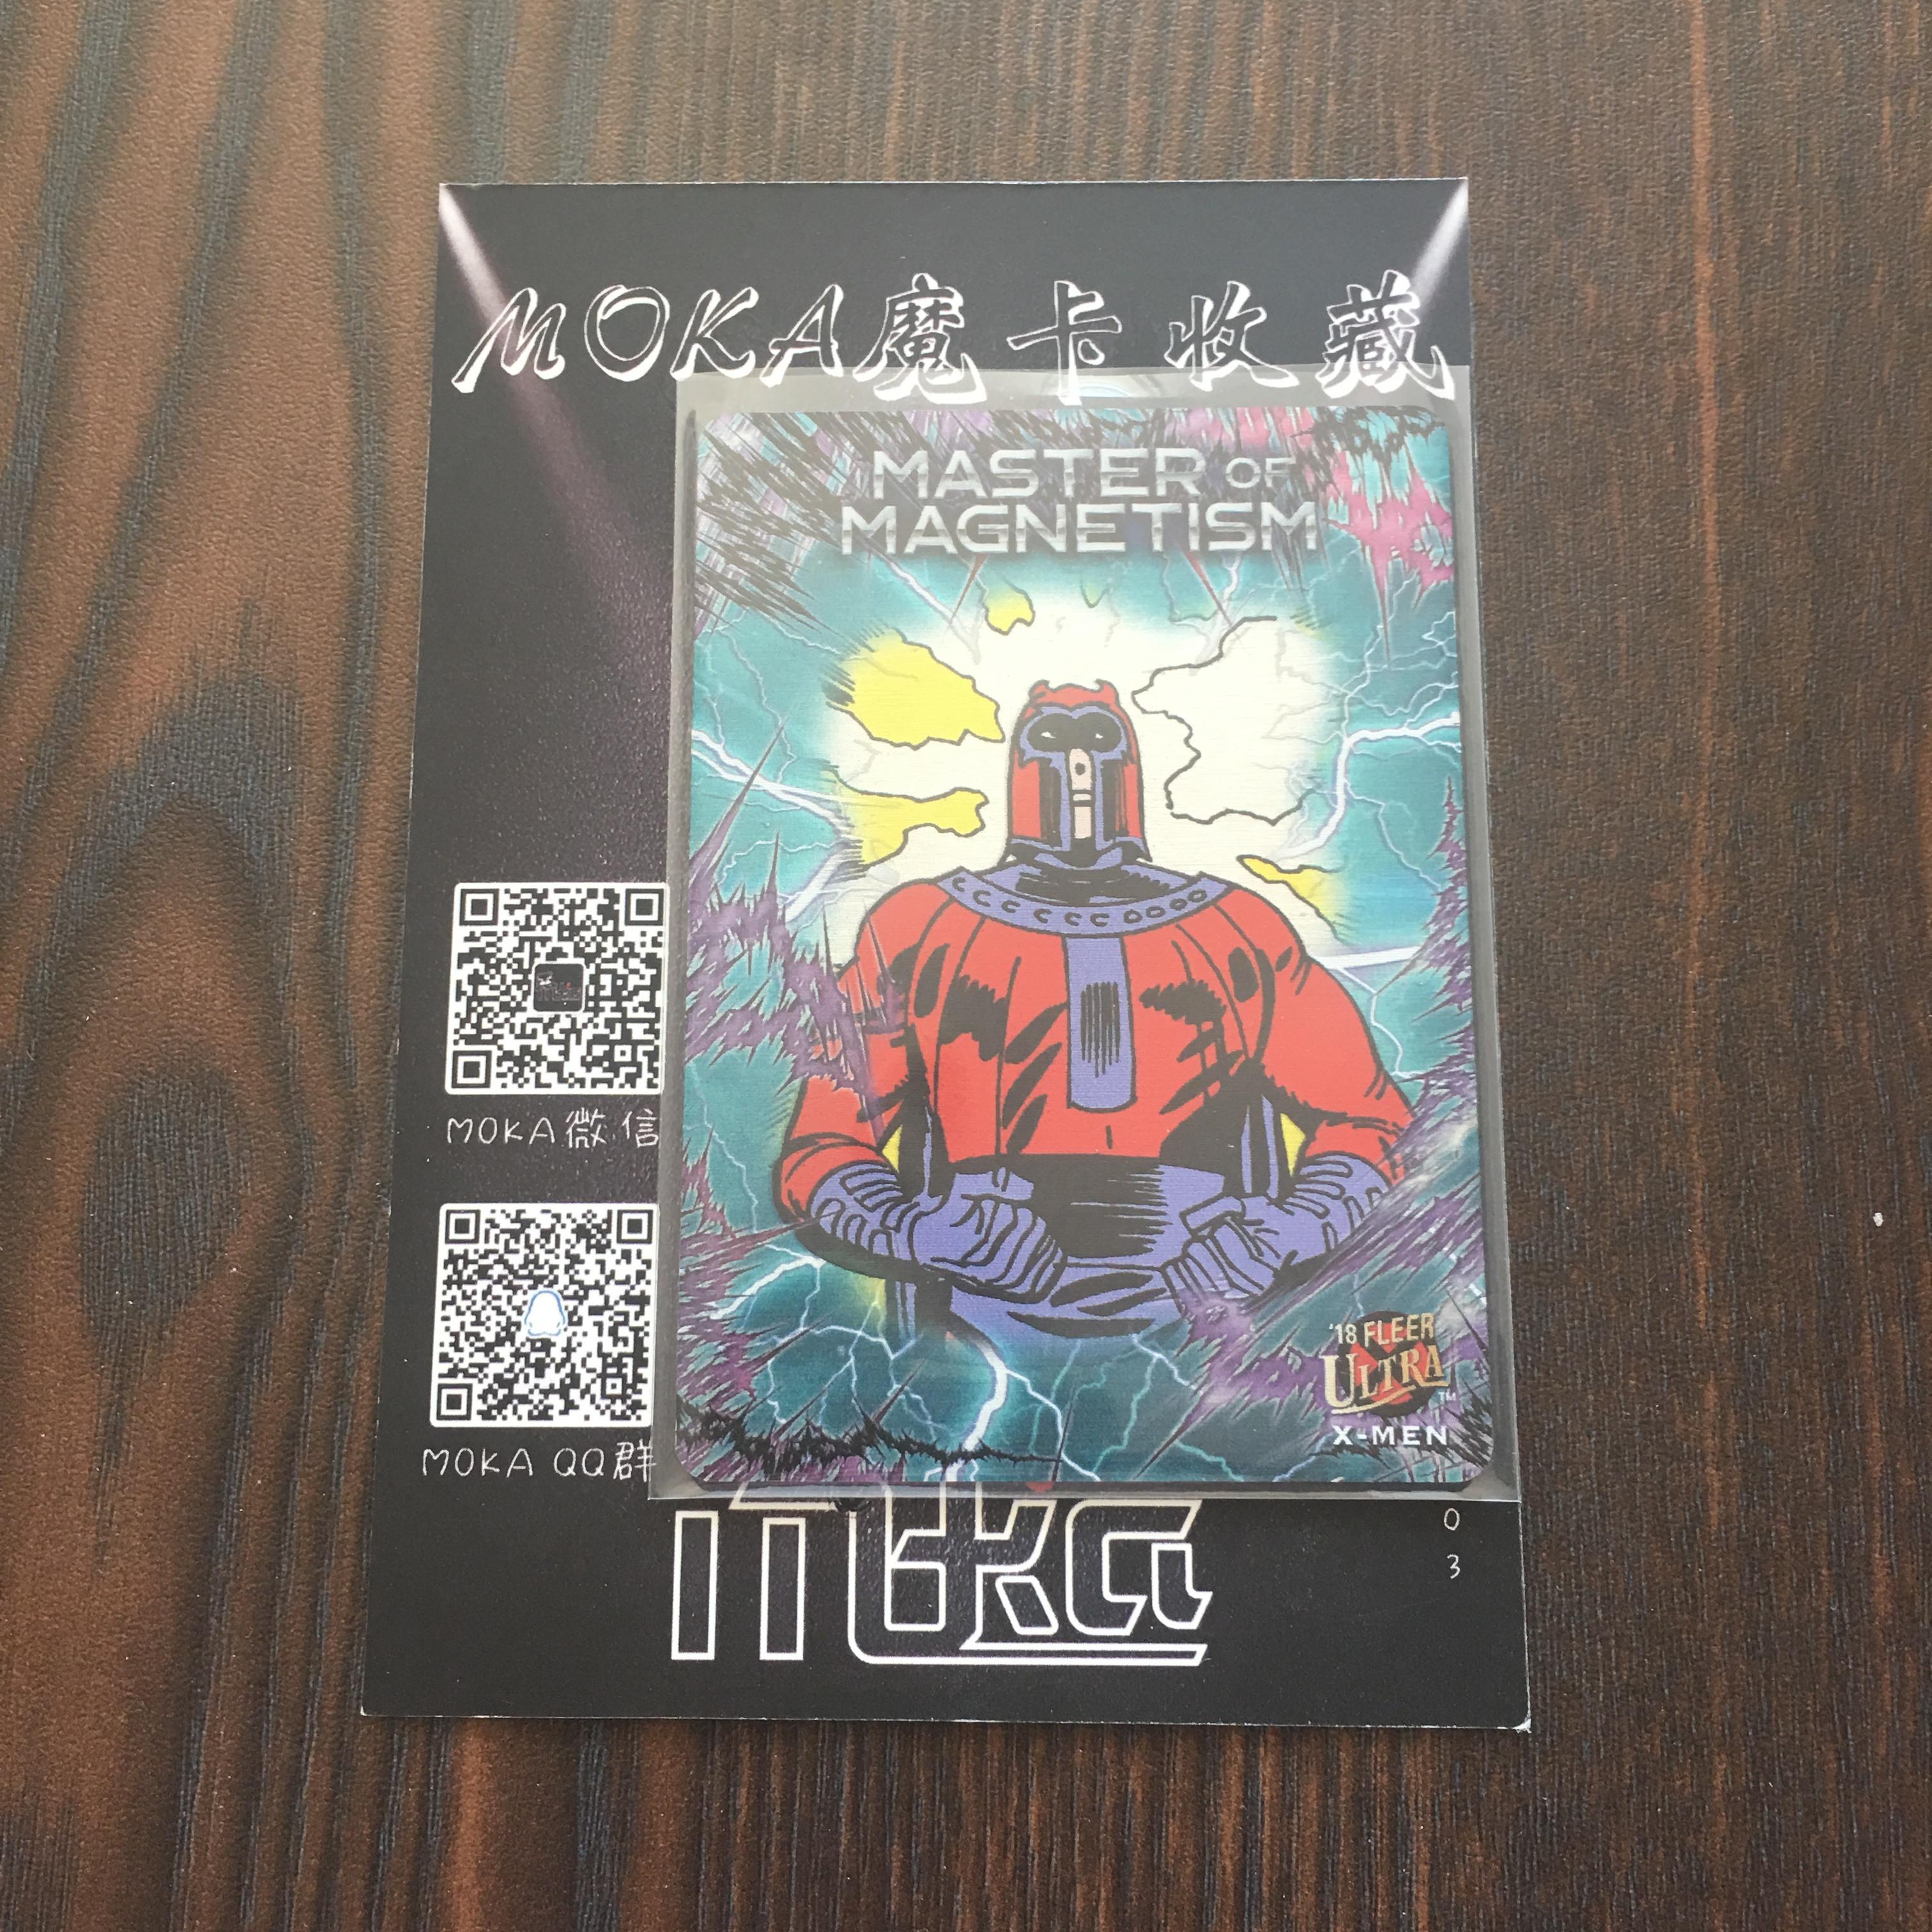 【MOKA球星卡收藏】#1804364 2018 Fleer X战警 铁板卡 大比例 编号 MM1 凑套必备